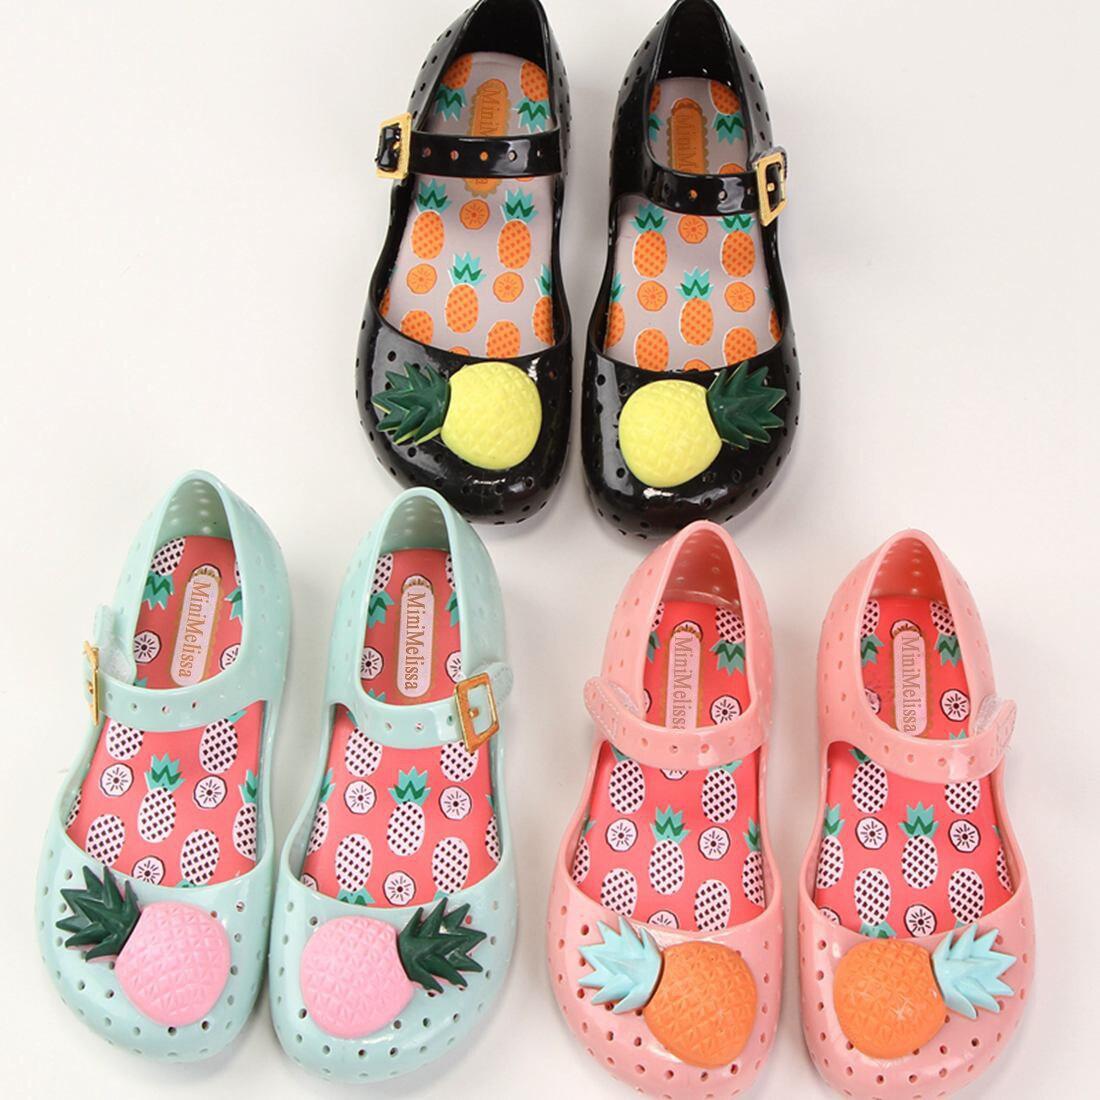 hot2018 Mini Melissa Pineapple Shoe New Summer Arrival Soft Plastic Girls Sandals Hollow Sweet Smell Kids Shoes Children